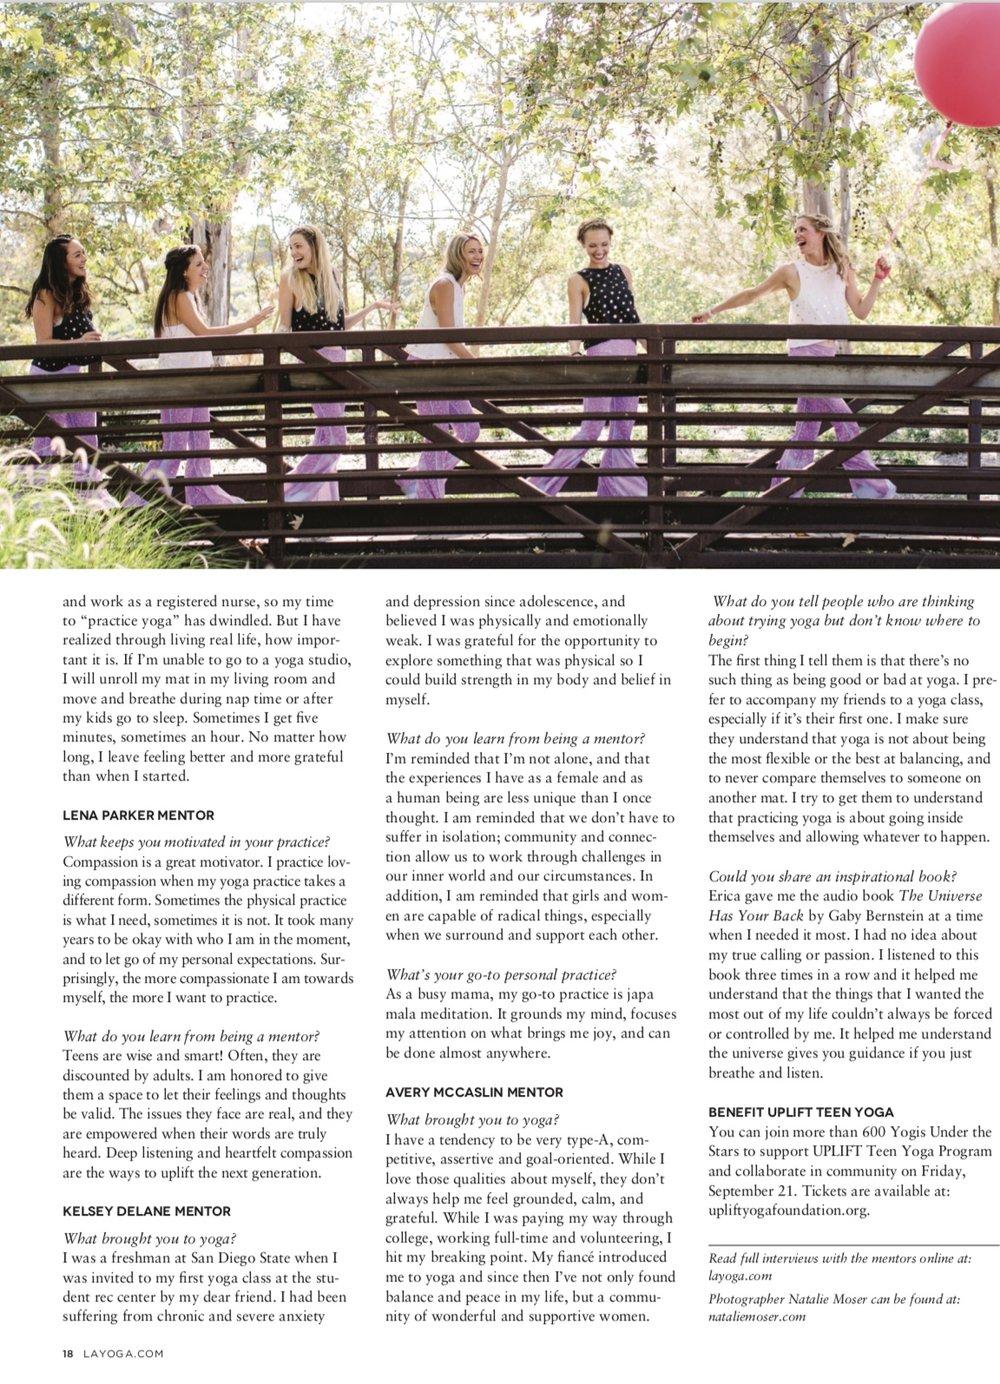 LA Yoga Magazine, September 2018